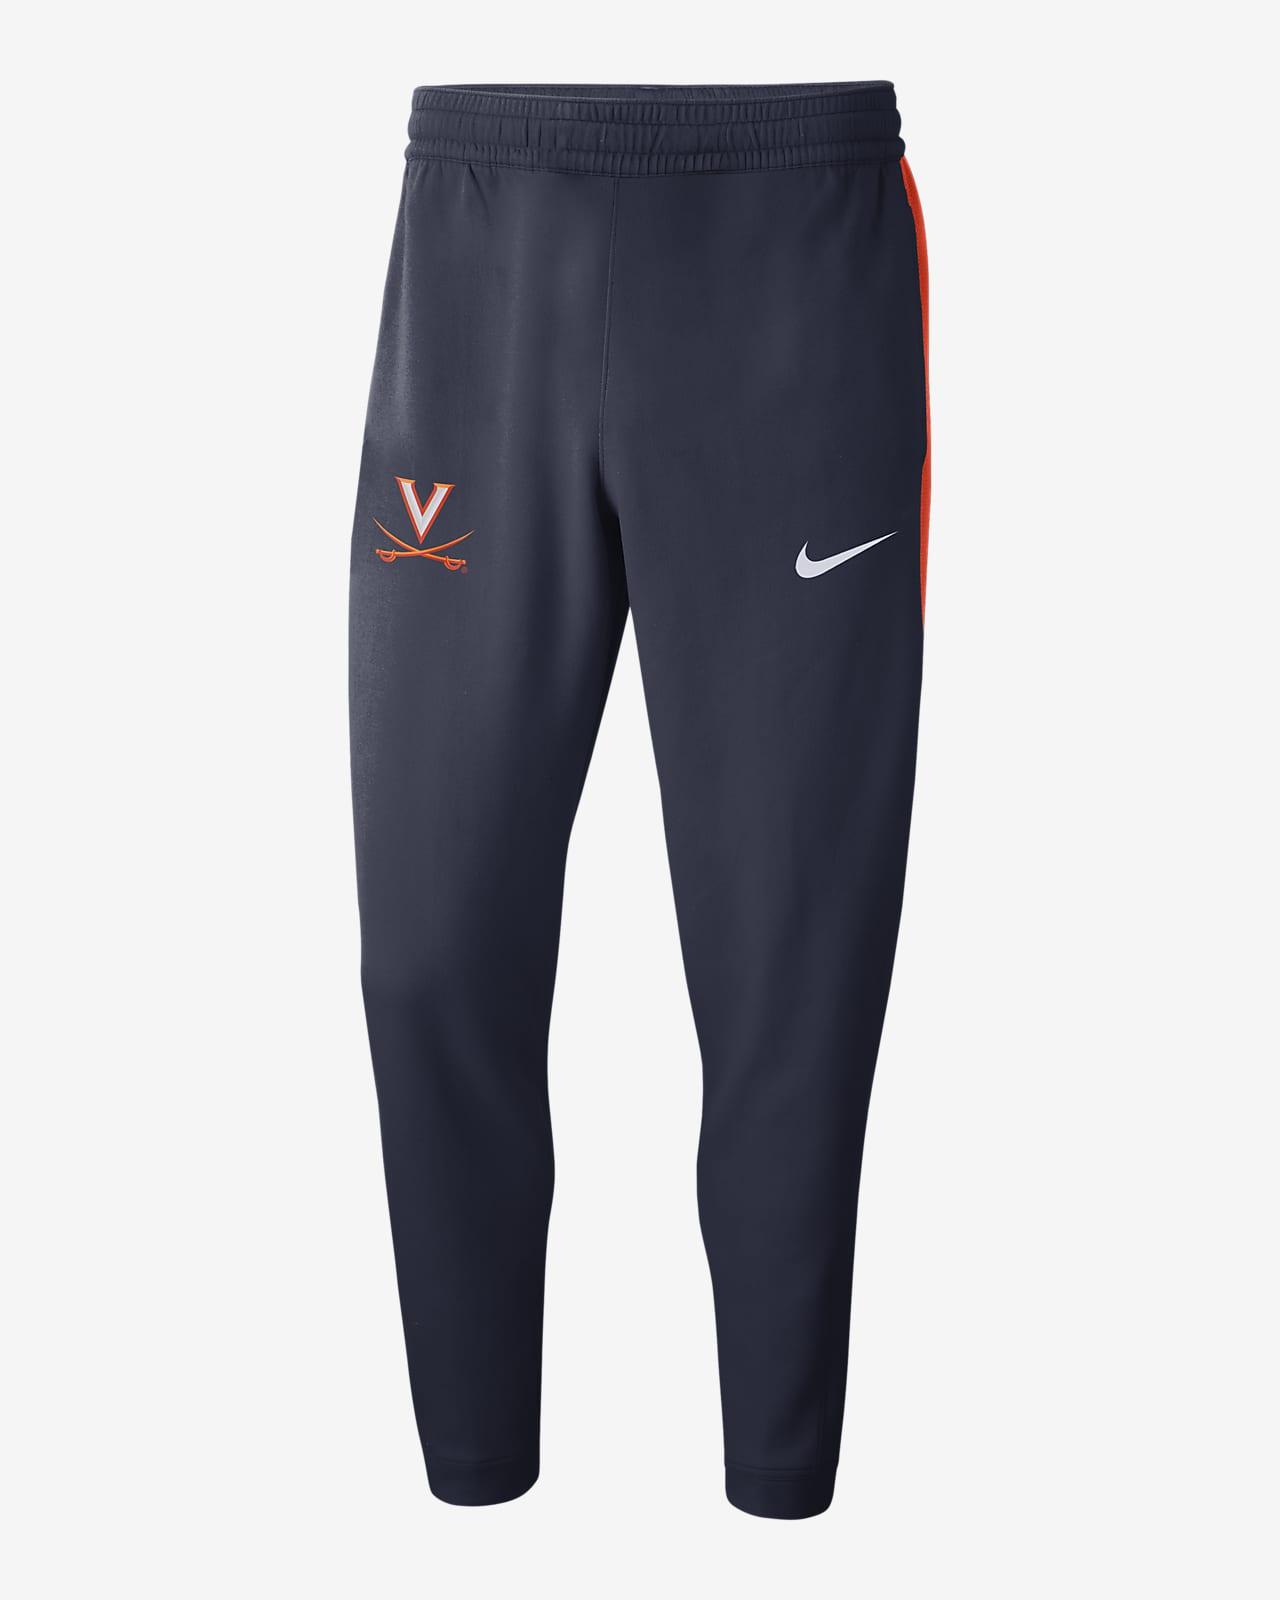 Nike College Spotlight (Virginia) Men's Pants